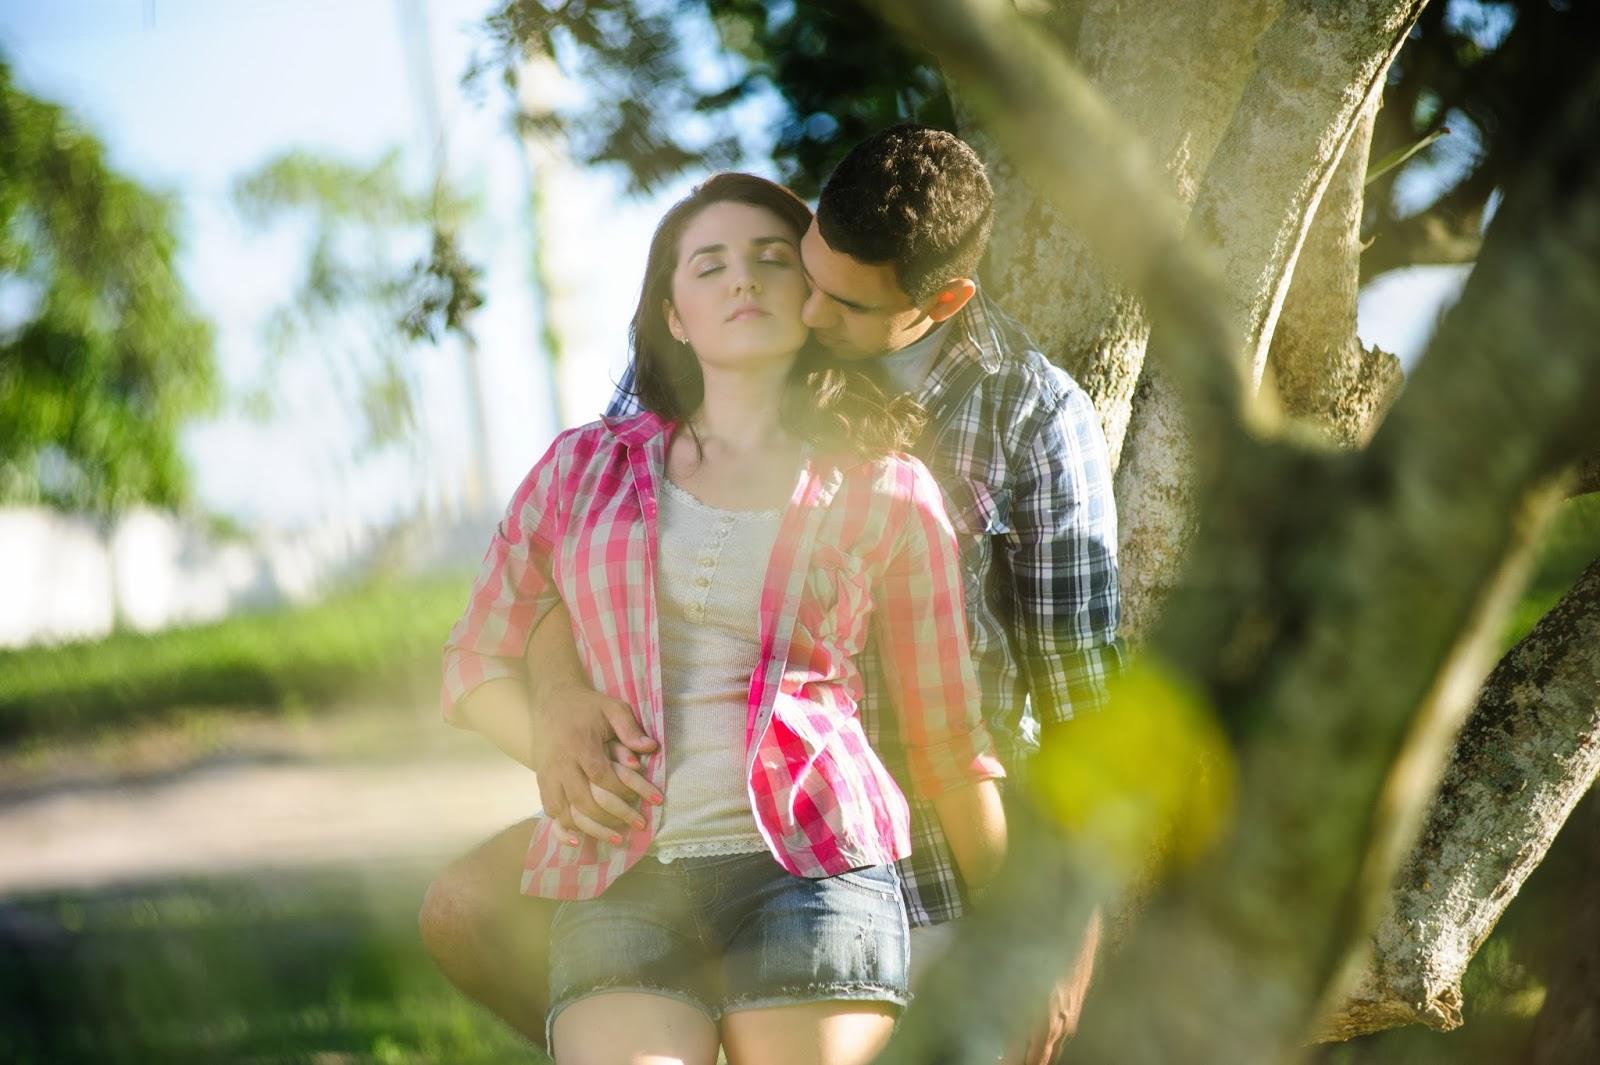 esession-casal-fotografos-beijo-3